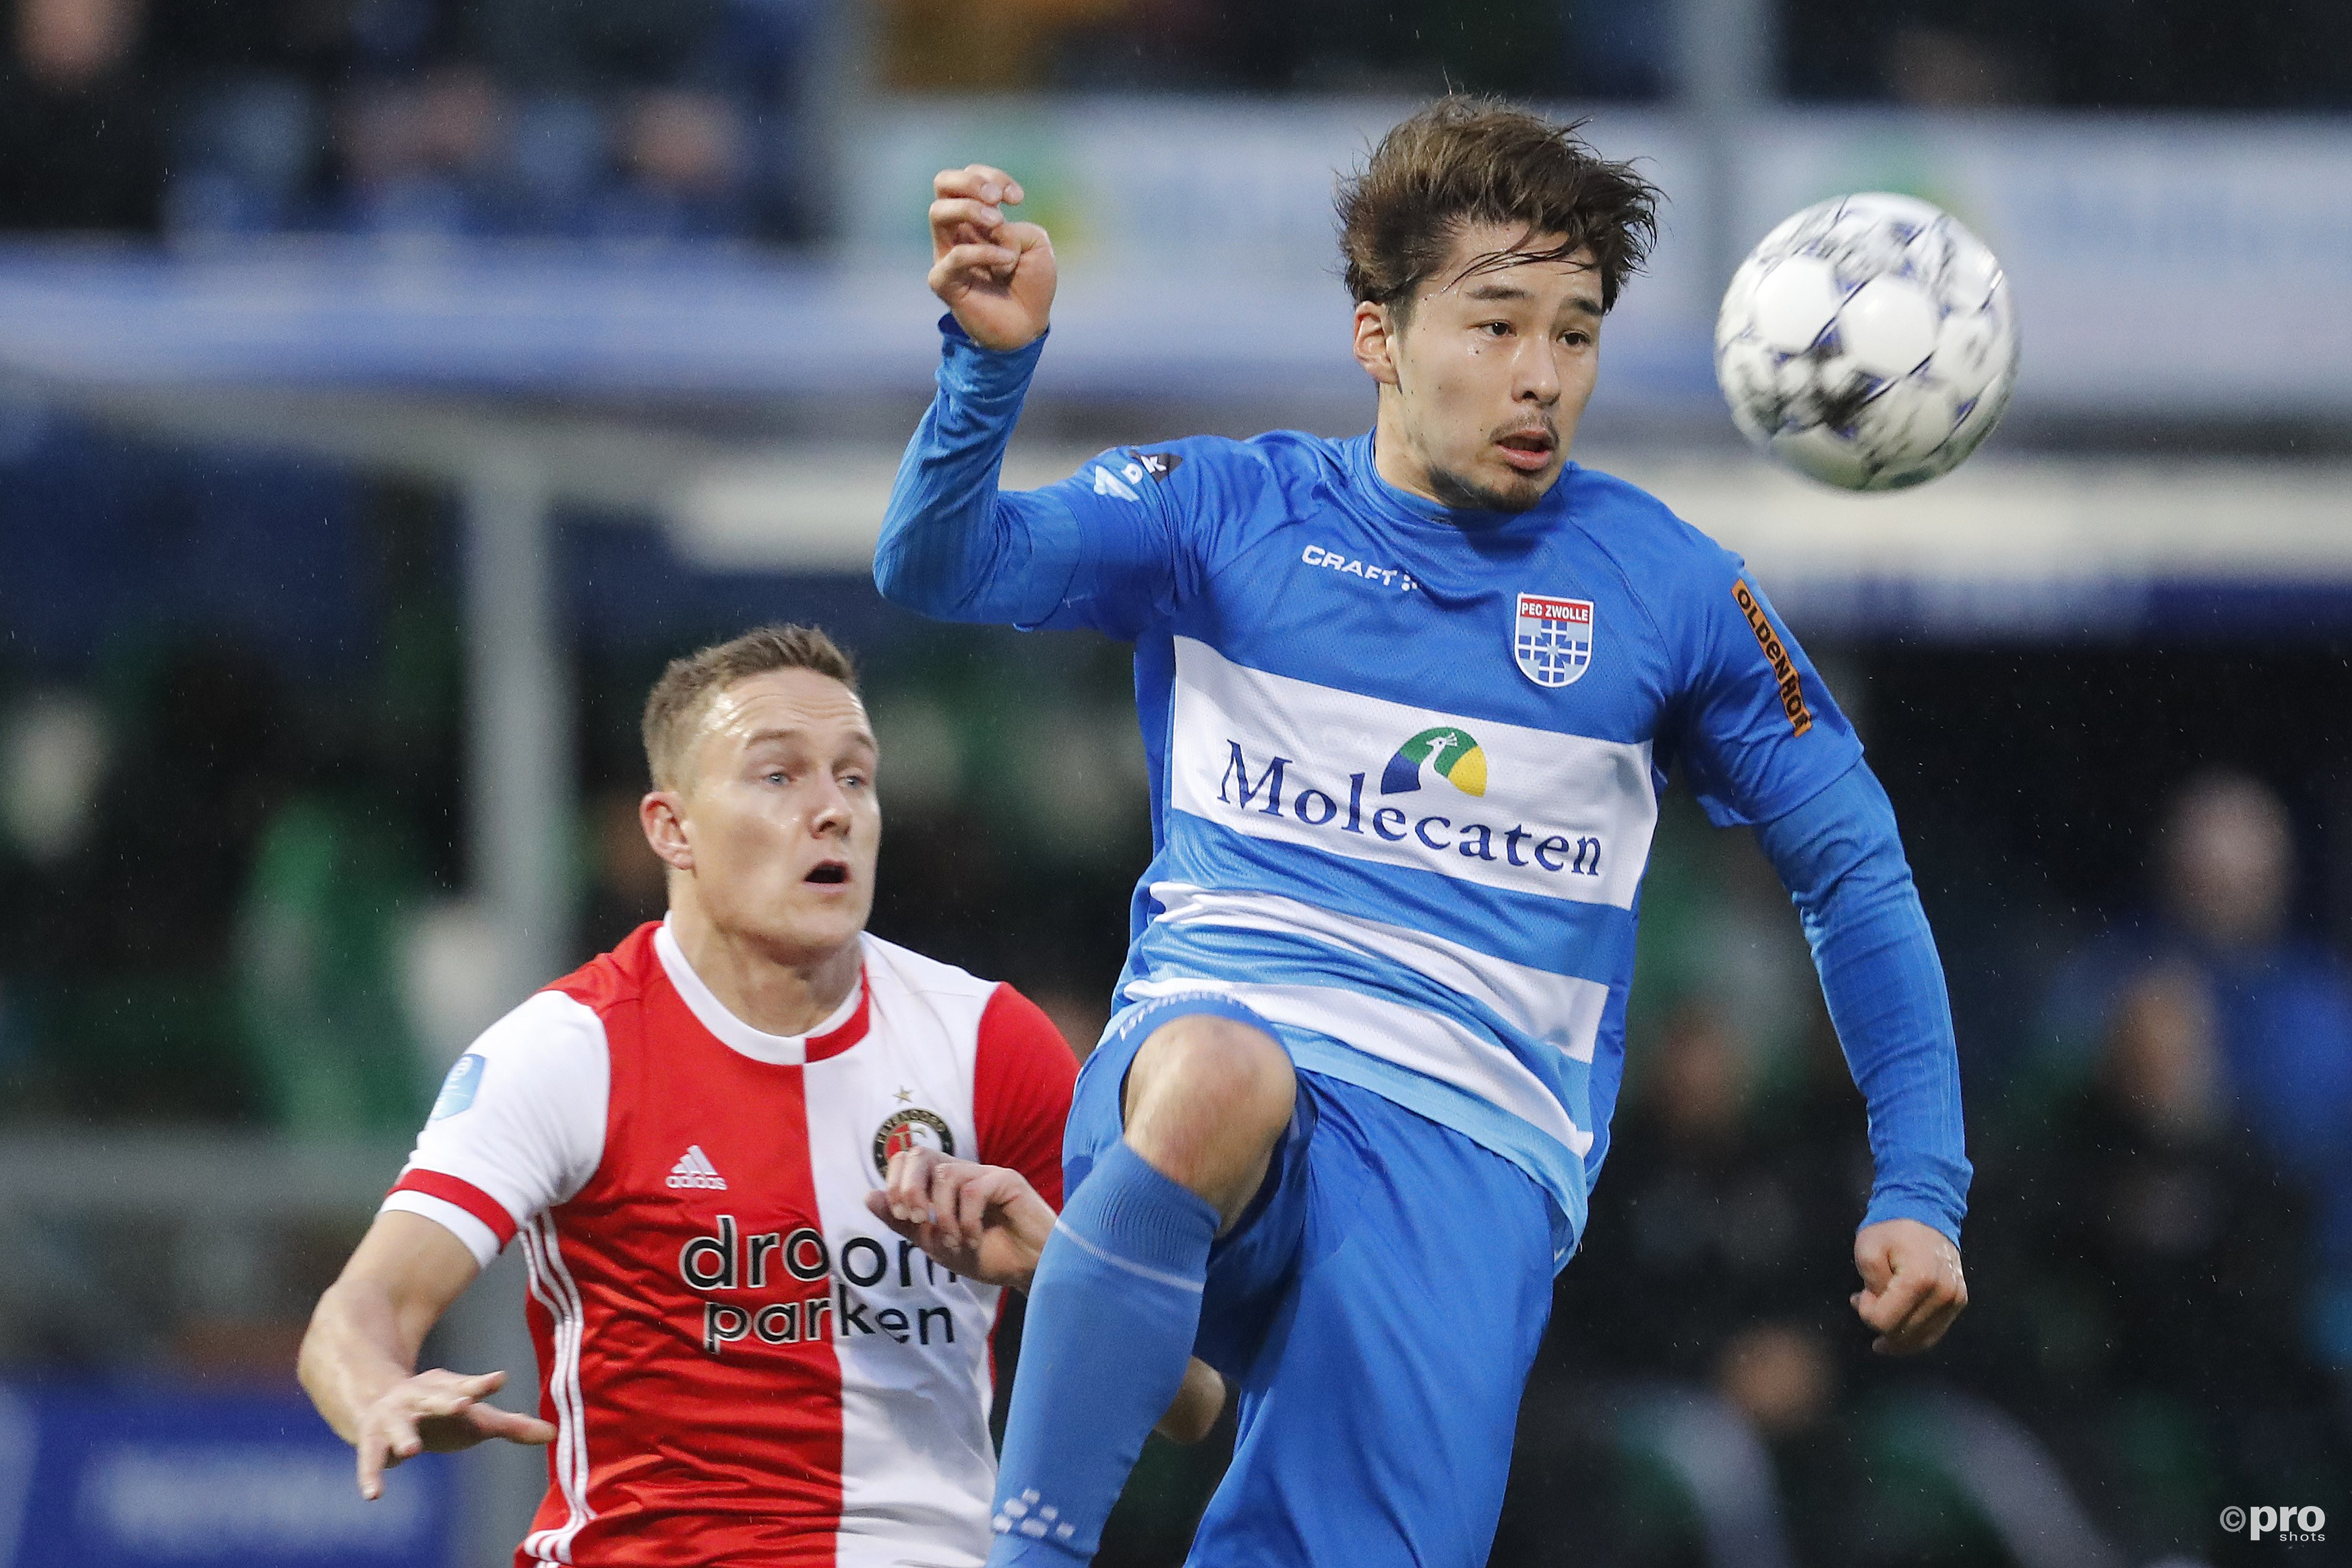 Jens Toornstra in duel met Yuta Nakayama. (PRO SHOTS/Niels Boersema)